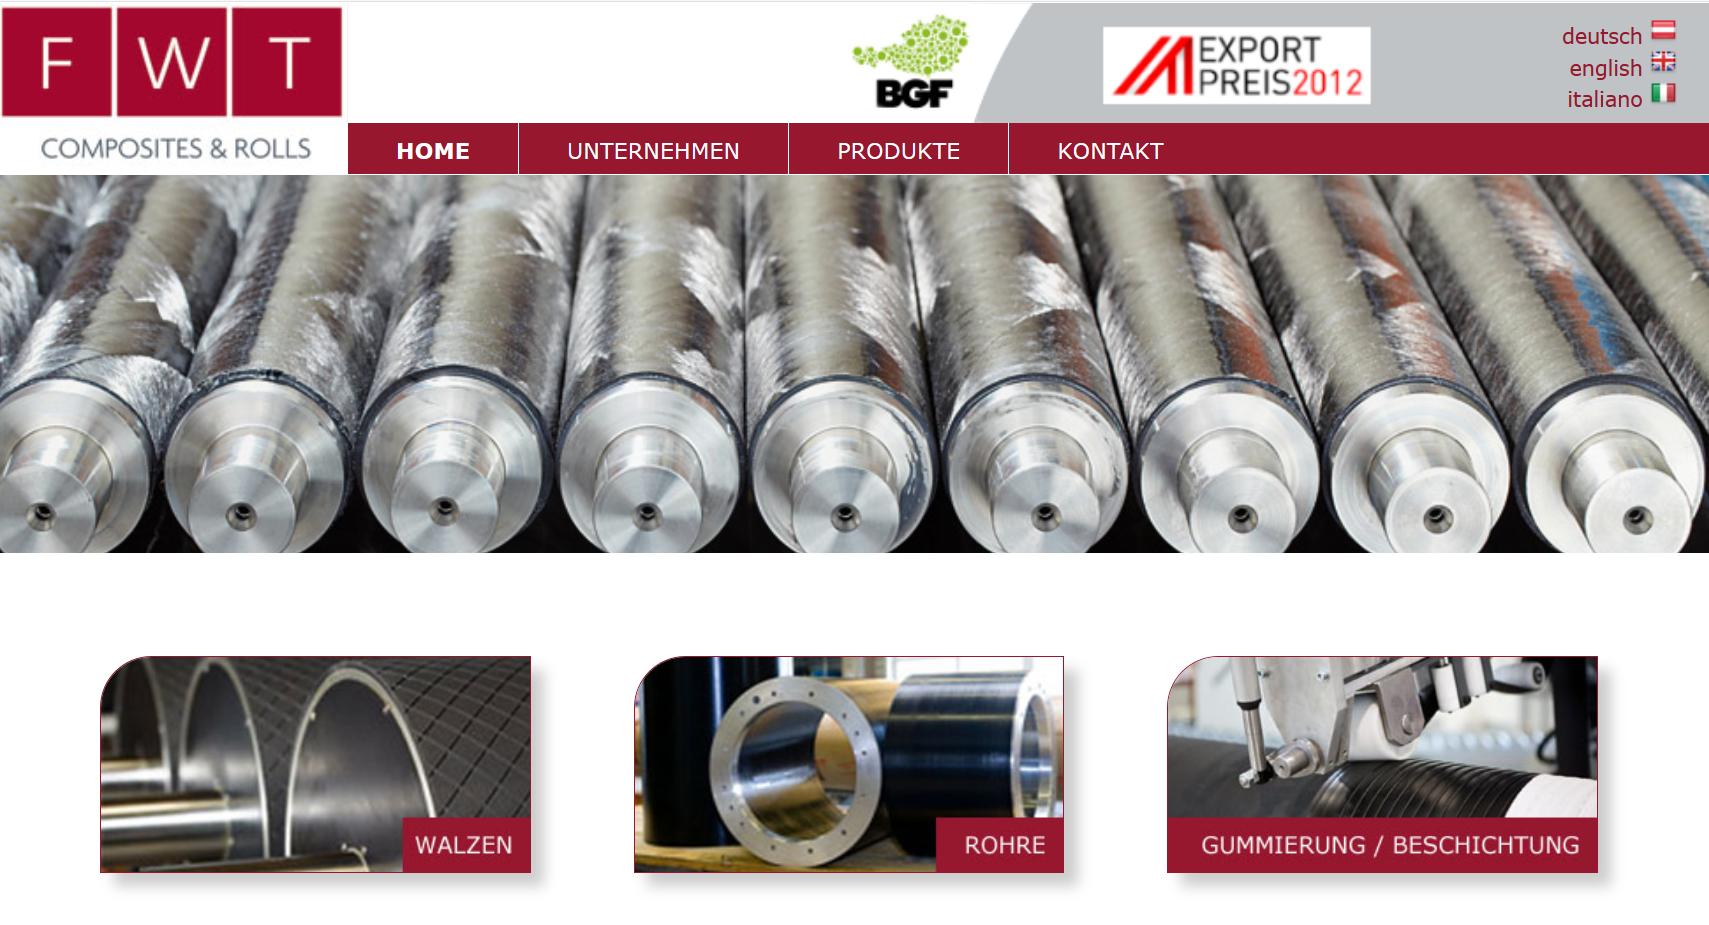 FWT Composites & Rolls GmbH exportiert 93 Prozent ihres neuen Walzenbezugs